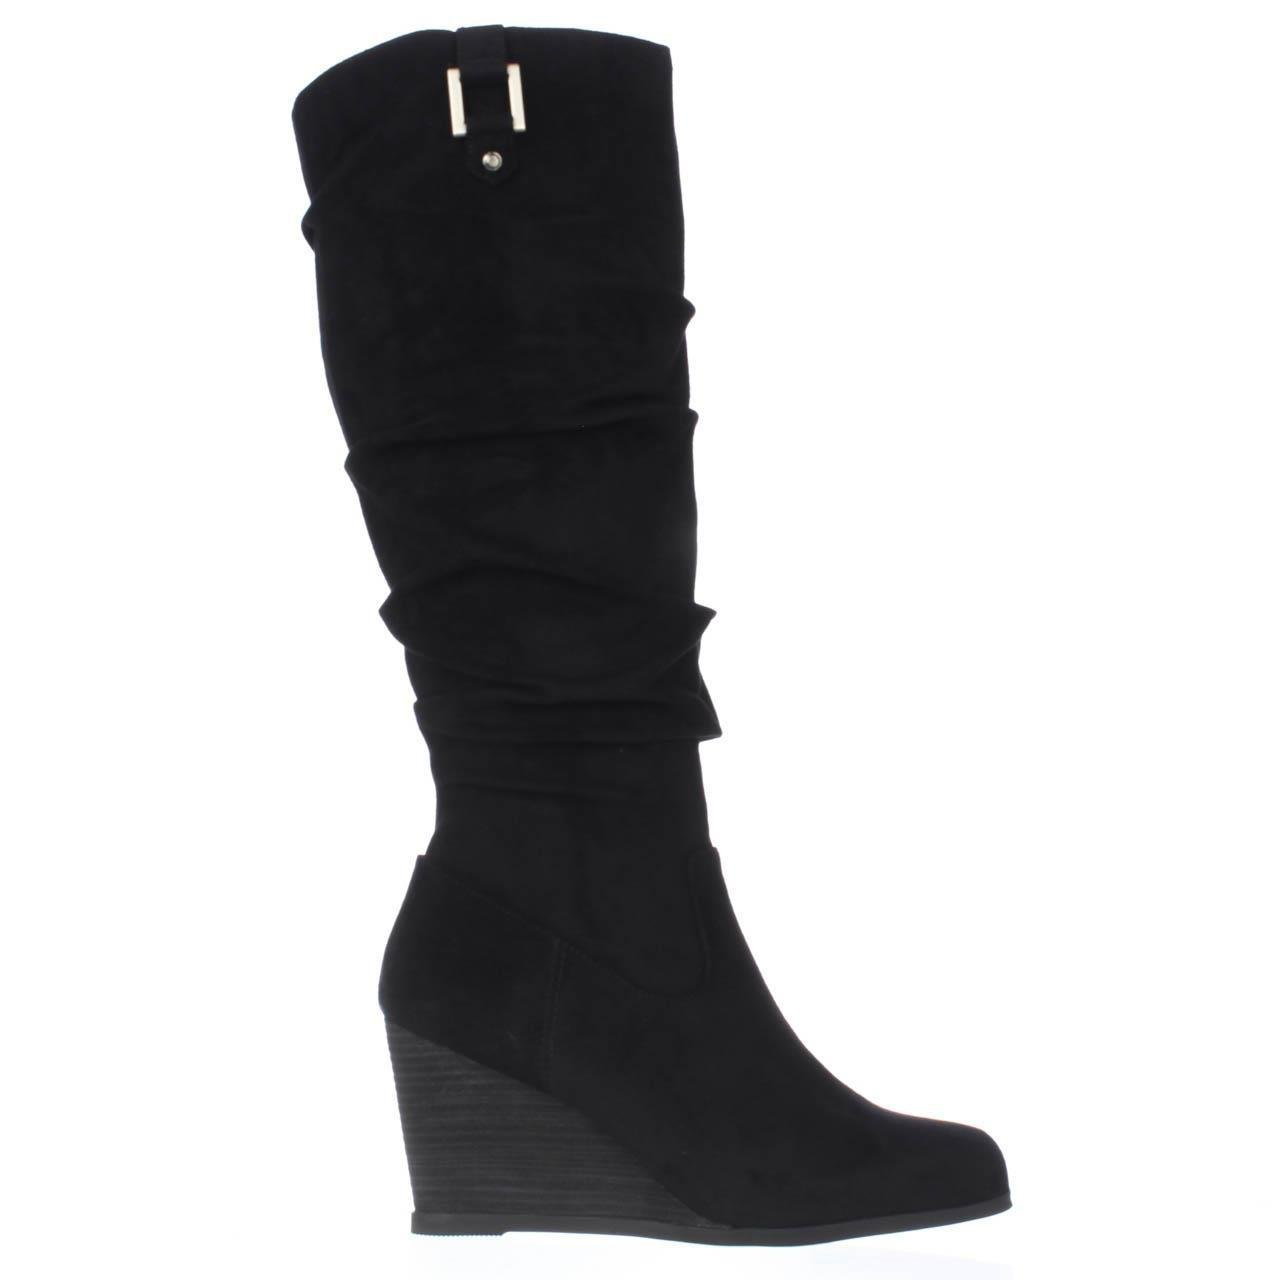 913ba0937ea7 Lyst - Dr. Scholls Poe Wedge Slouch Boots in Black